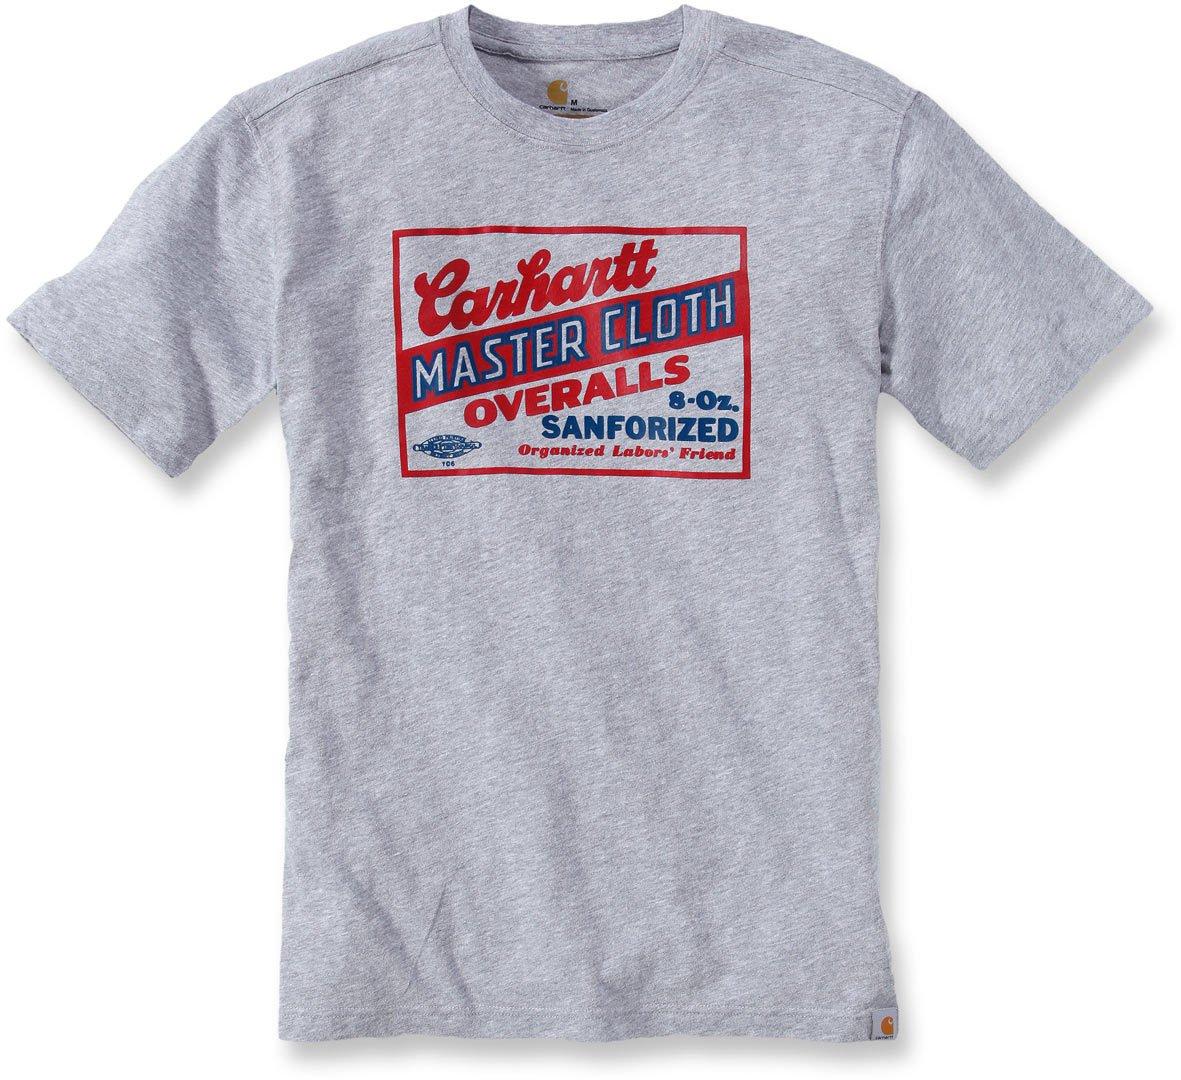 Carhartt Maddock Master T-Shirt XL 102886